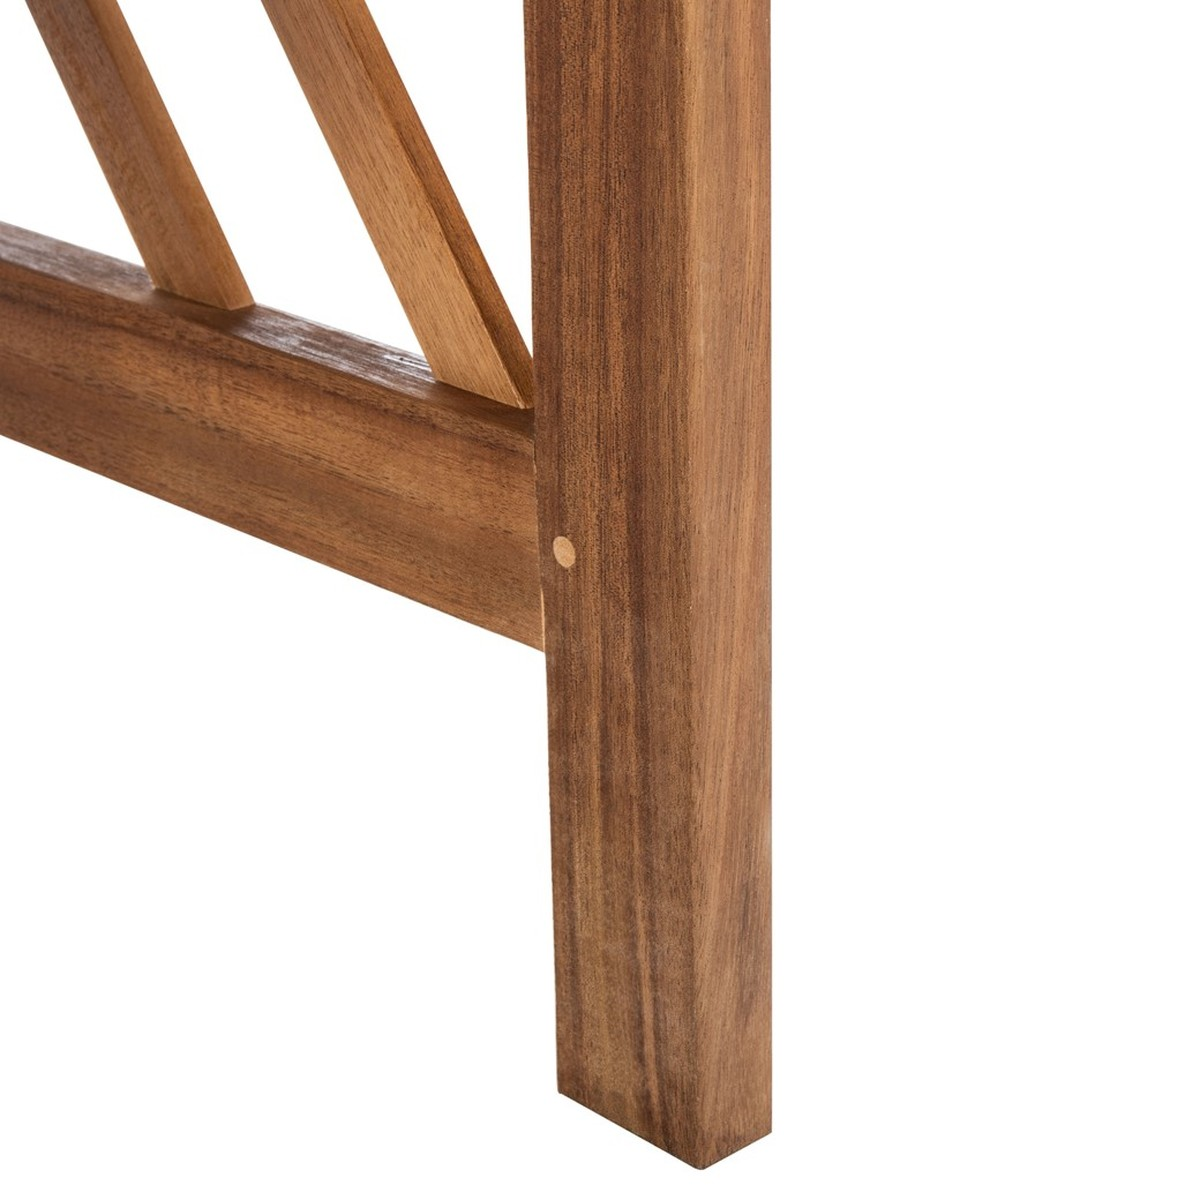 PAT7008F Patio Sets - 4 Piece - Furniture by Safavieh on Safavieh Fontana 4 Pc Outdoor Set id=99844